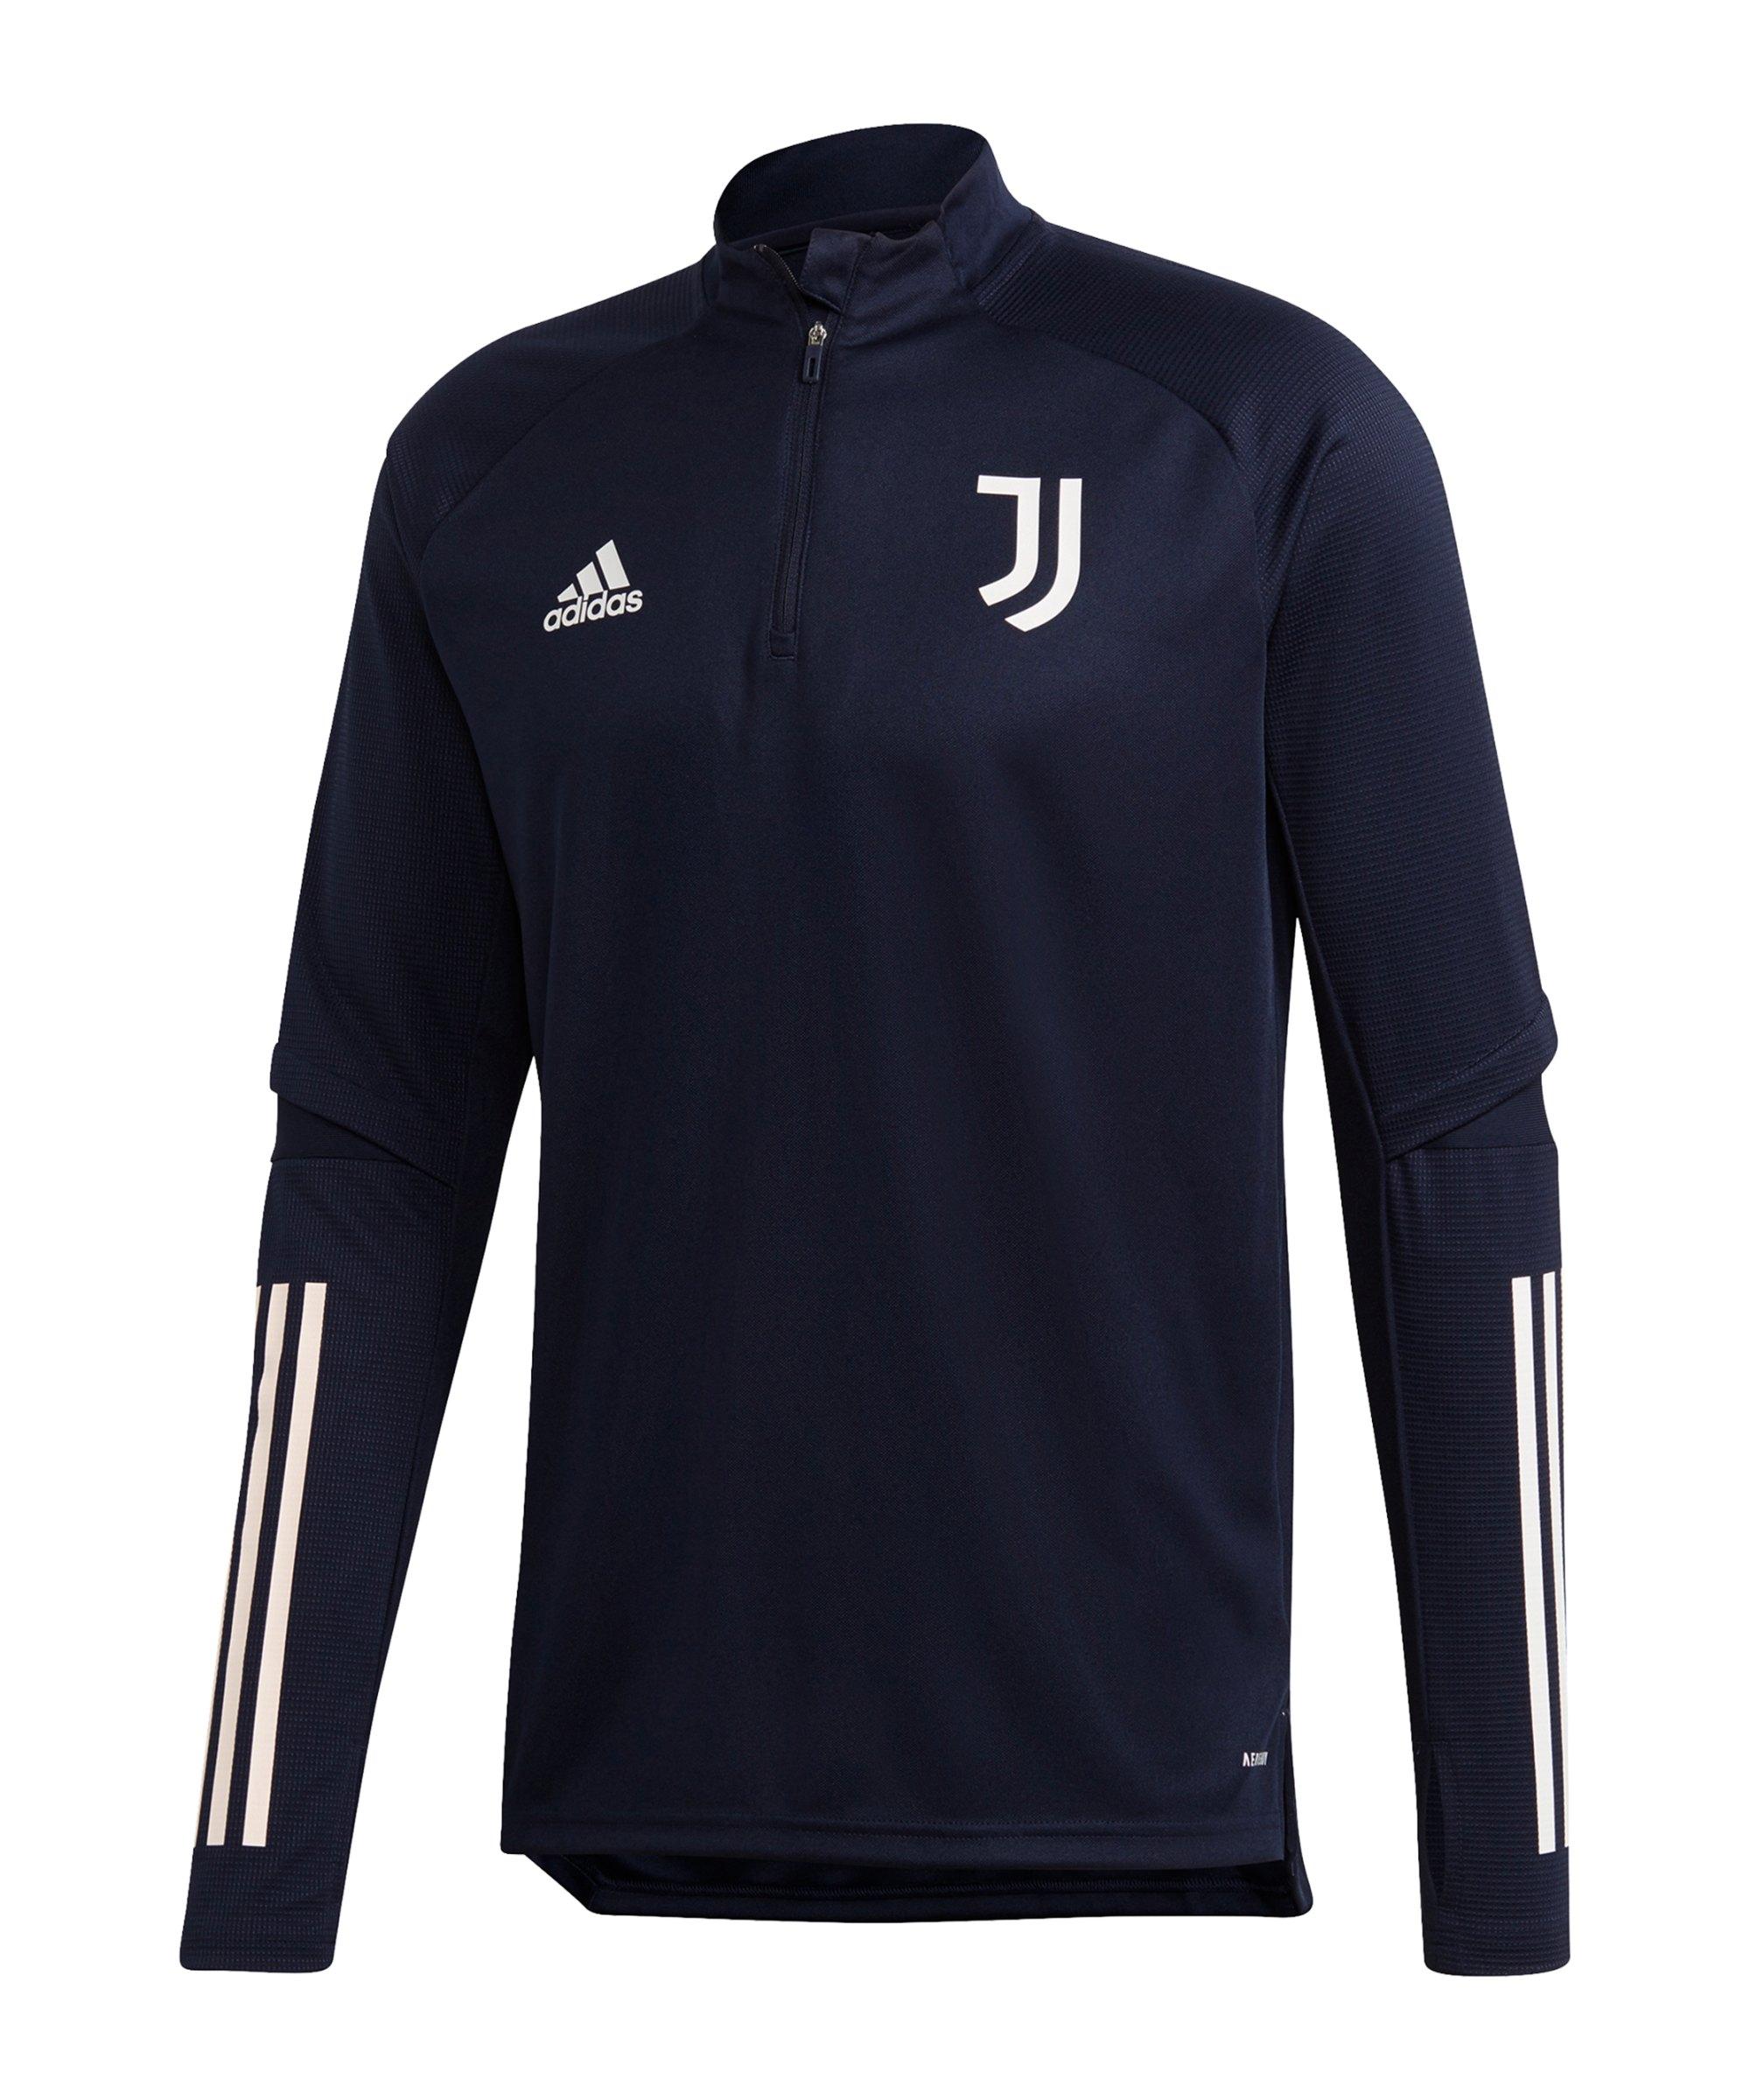 adidas Juventus Turin Trainingstop Blau Grau - blau